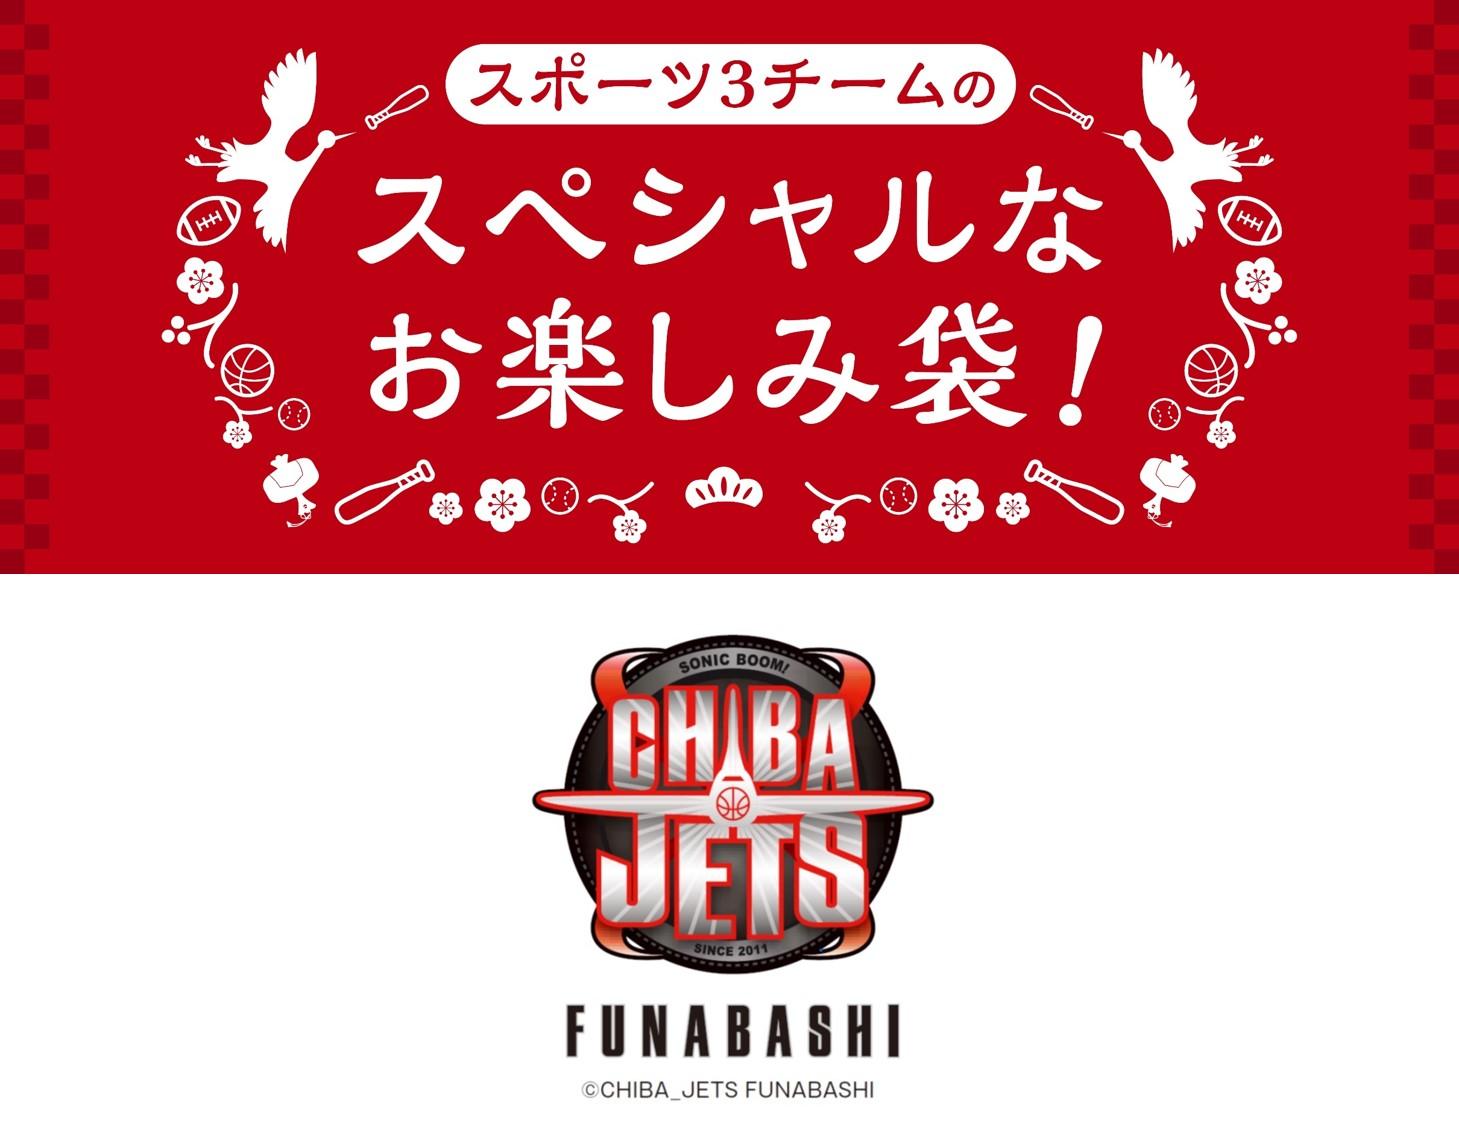 B.LEAGUE所属プロバスケットボールチーム「千葉ジェッツふなばし」のスペシャルなお楽しみ袋が登場!